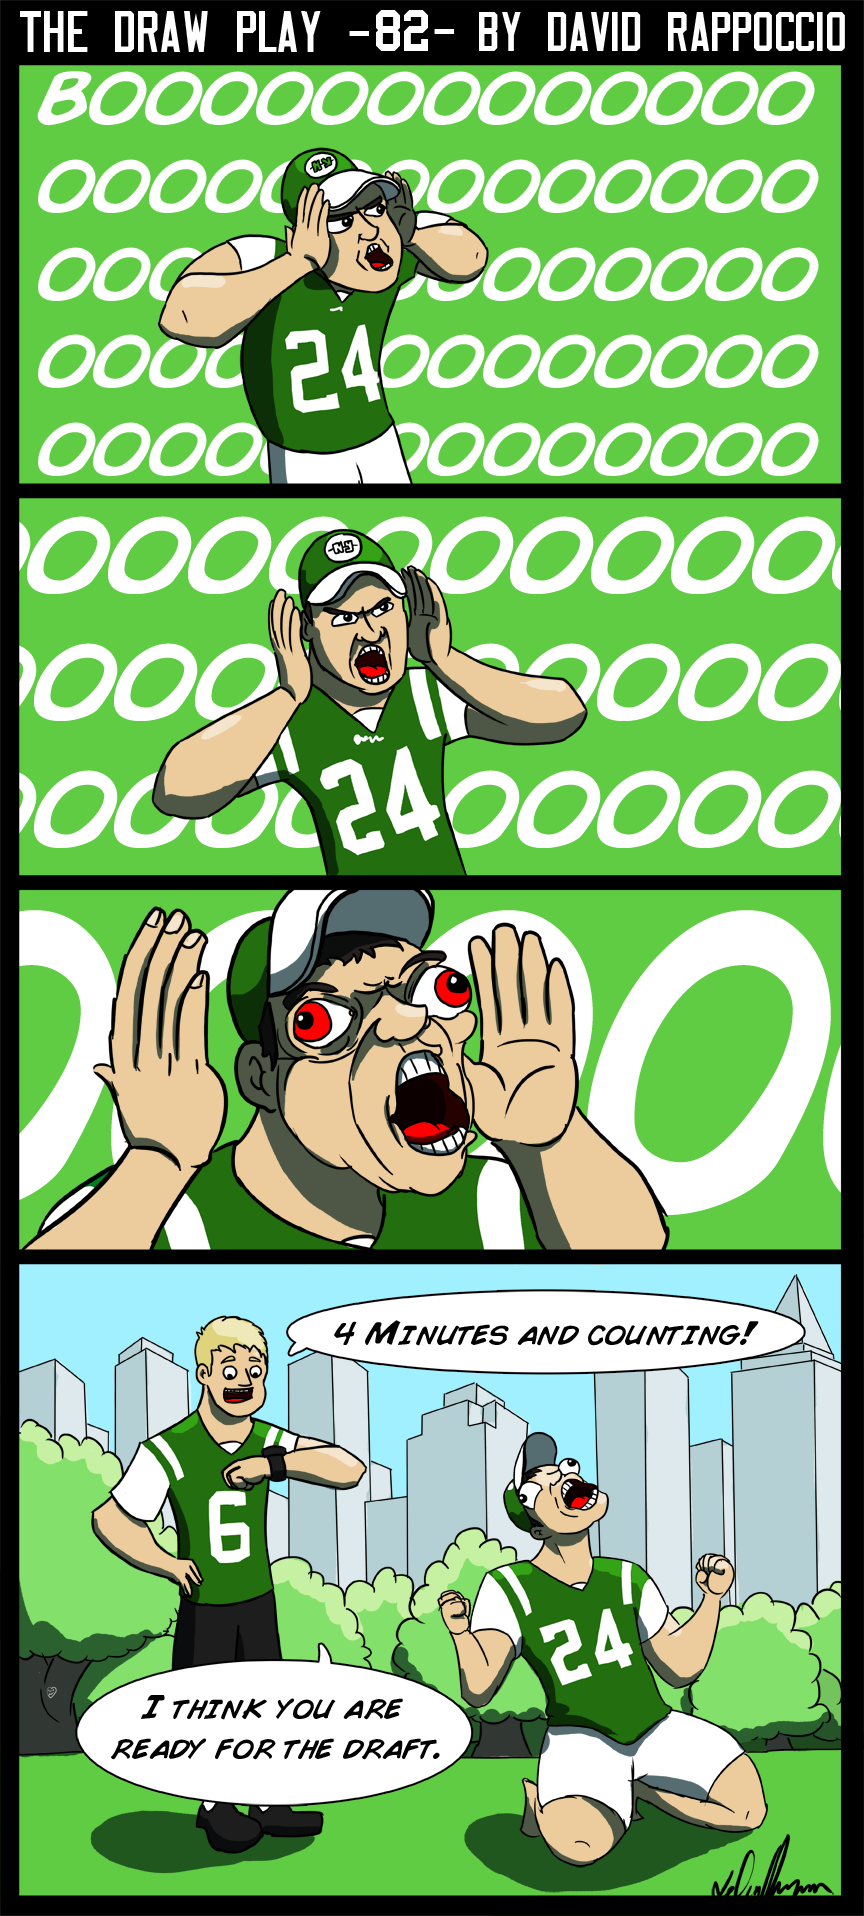 I hope the Jets draft Te'o so much